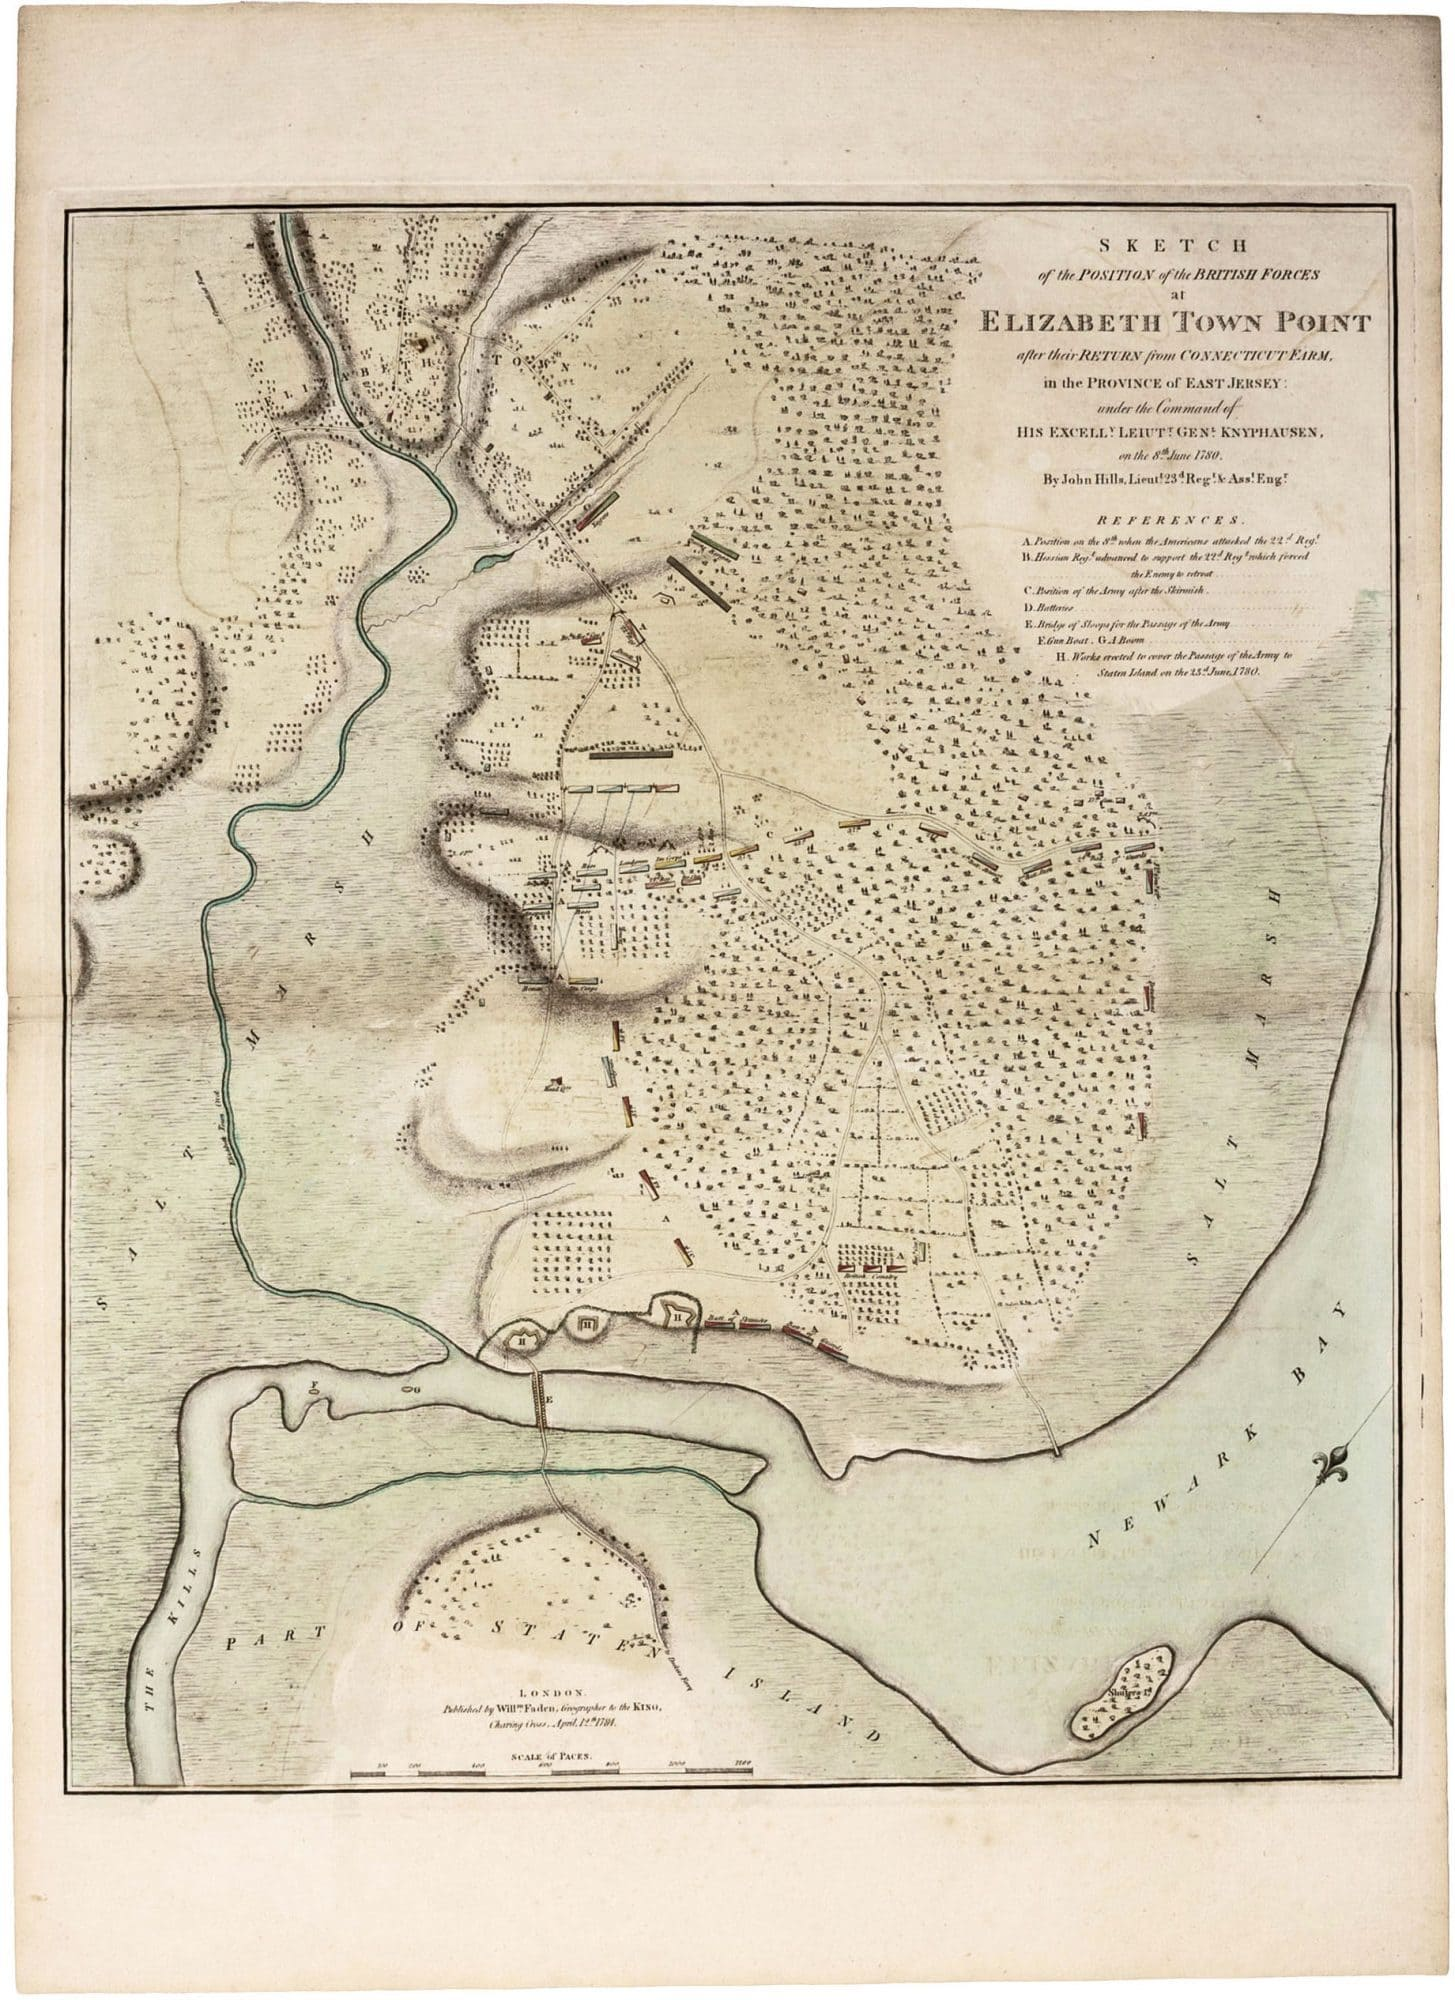 John hills map of the failed 1780 british invasion of new jersey john hills map of the failed 1780 british invasion of new jersey gumiabroncs Images